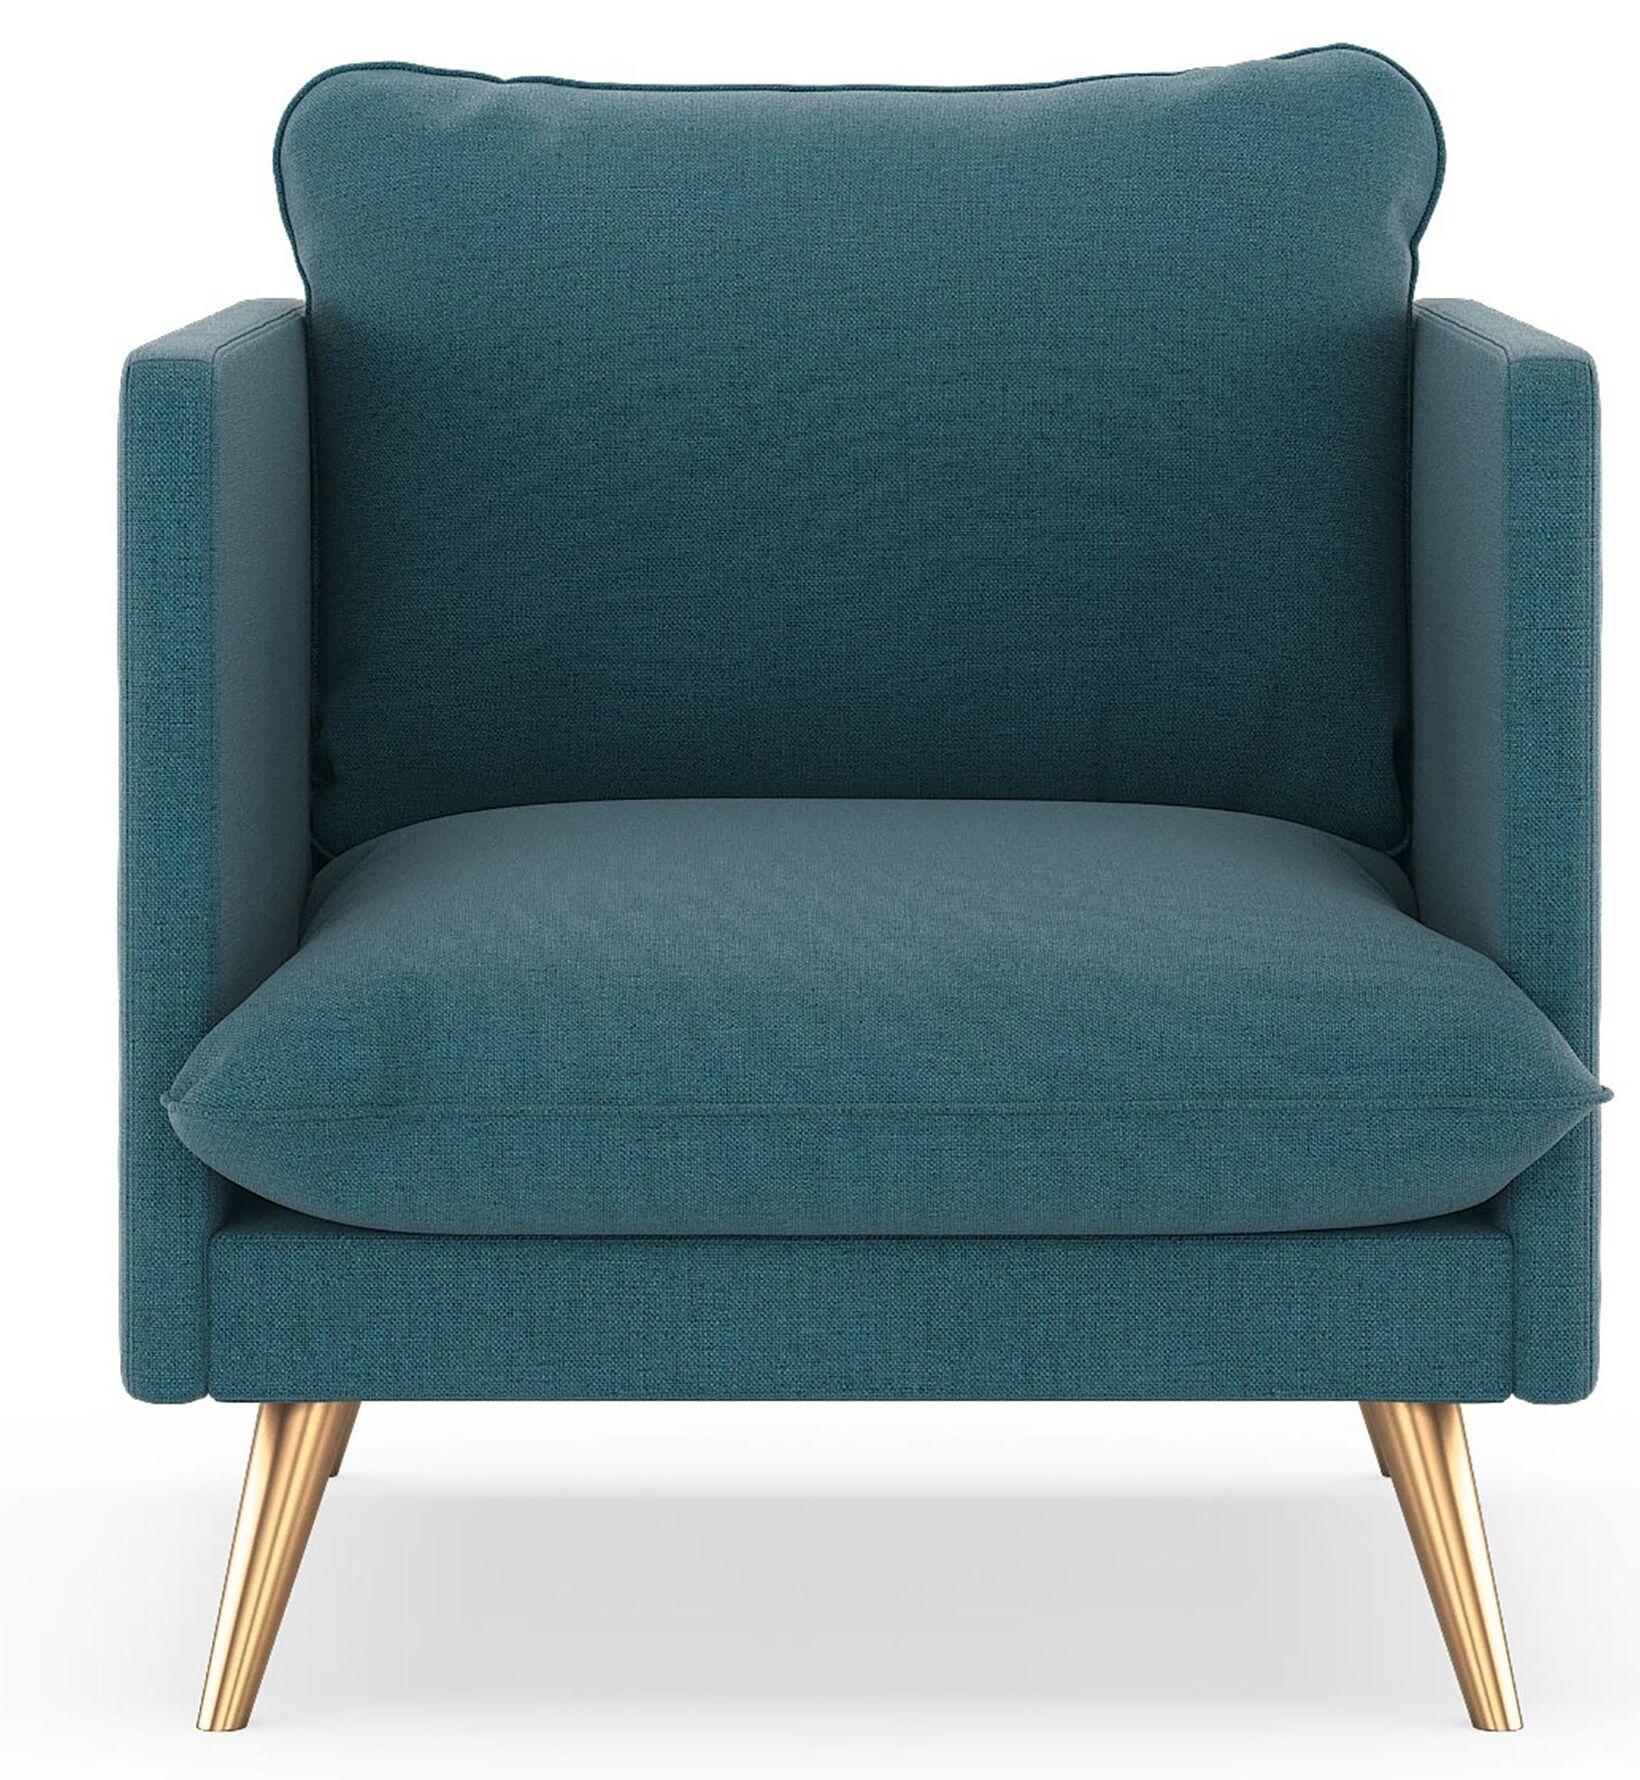 Covert Oxford Weave Armchair Finish: Black, Upholstery: Ocean Gray